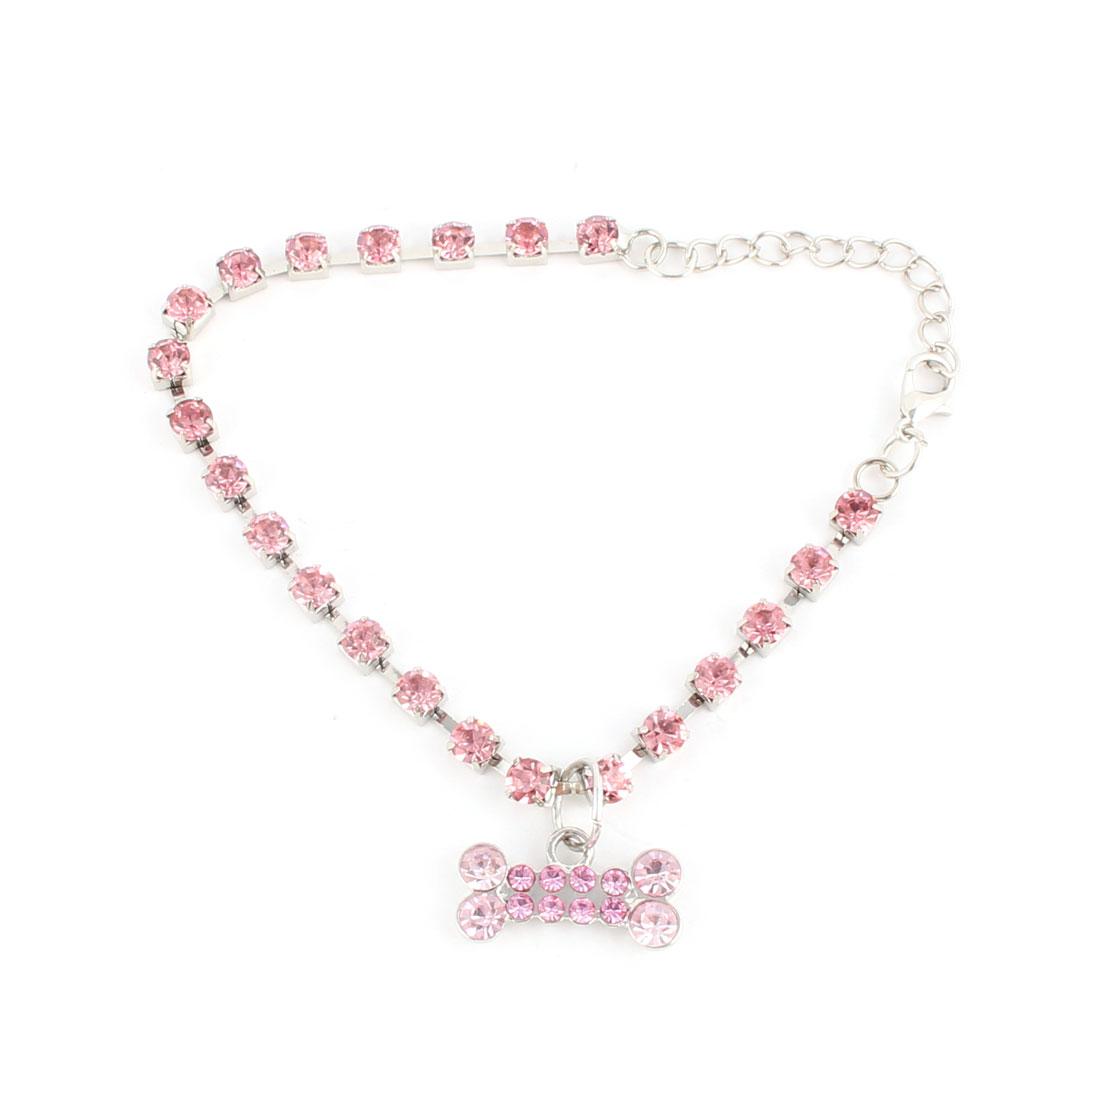 Pet Puppy Dog Bone Pattern Pendant Rhinestone Inlaid Necklace Neck Chain Pink